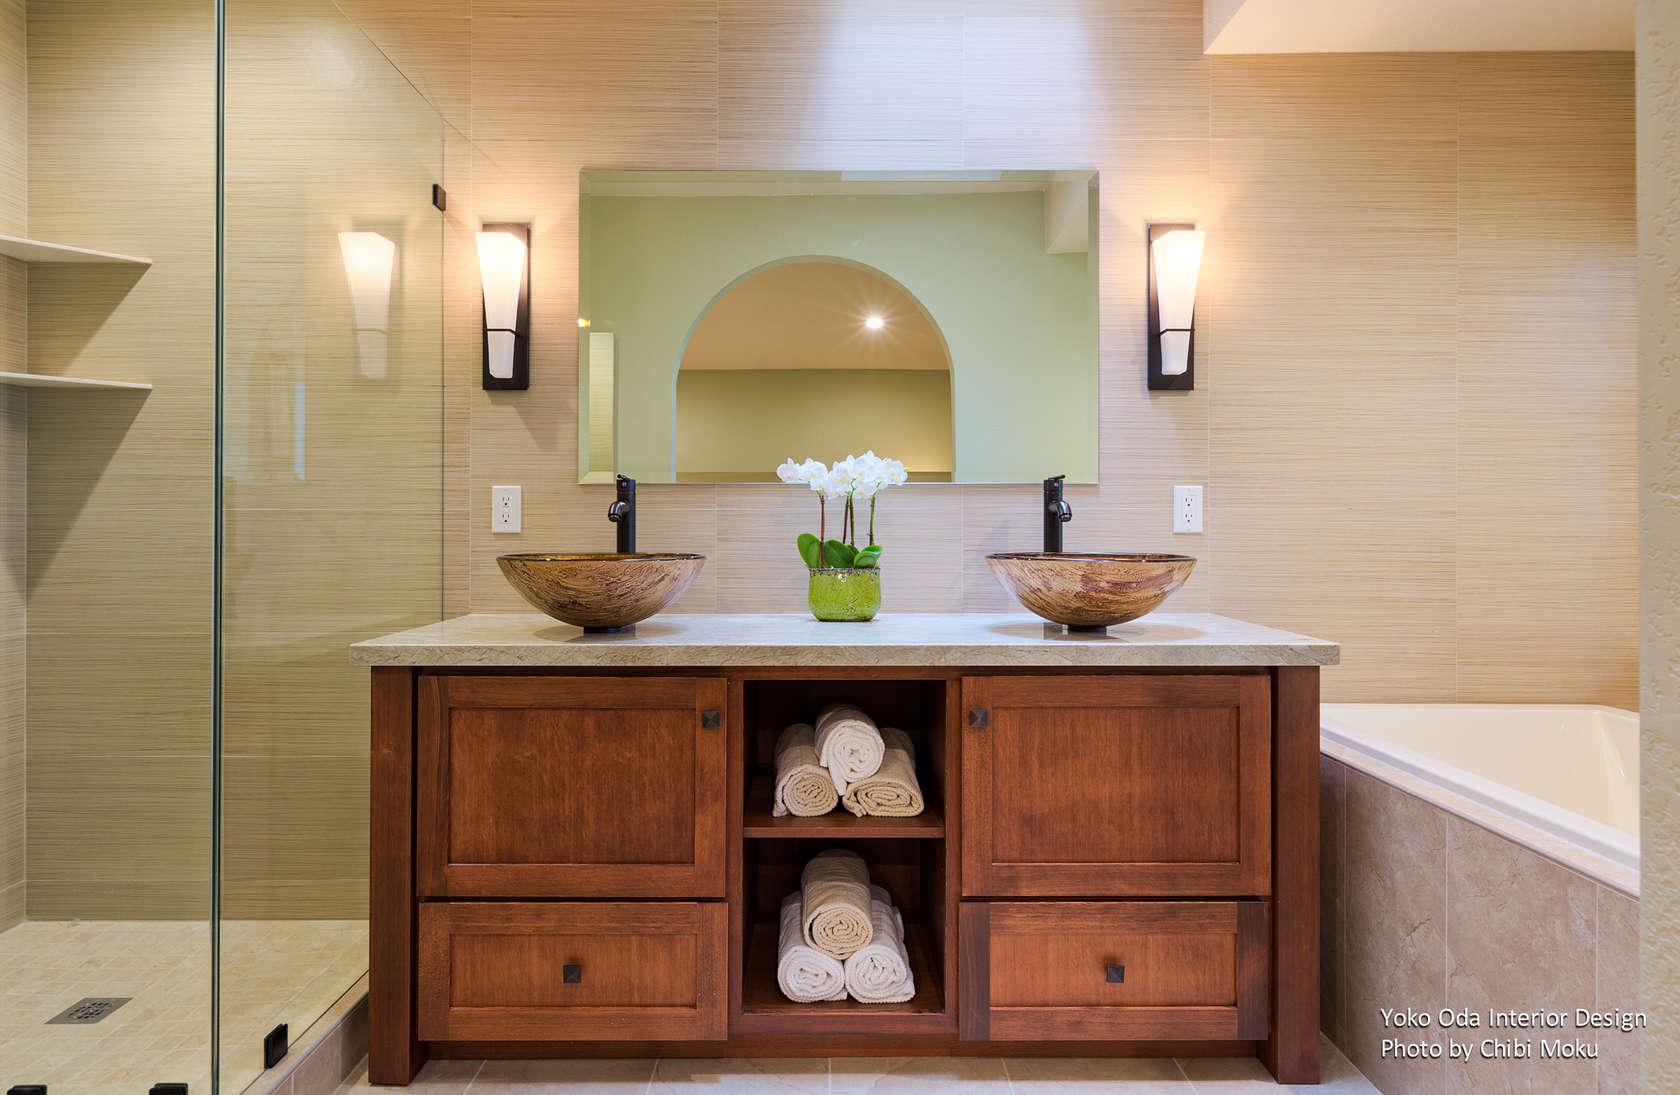 Yoko Oda Interior Design Zen Bathroom Walnut Creek Ca Architect Magazine Chibi Moku